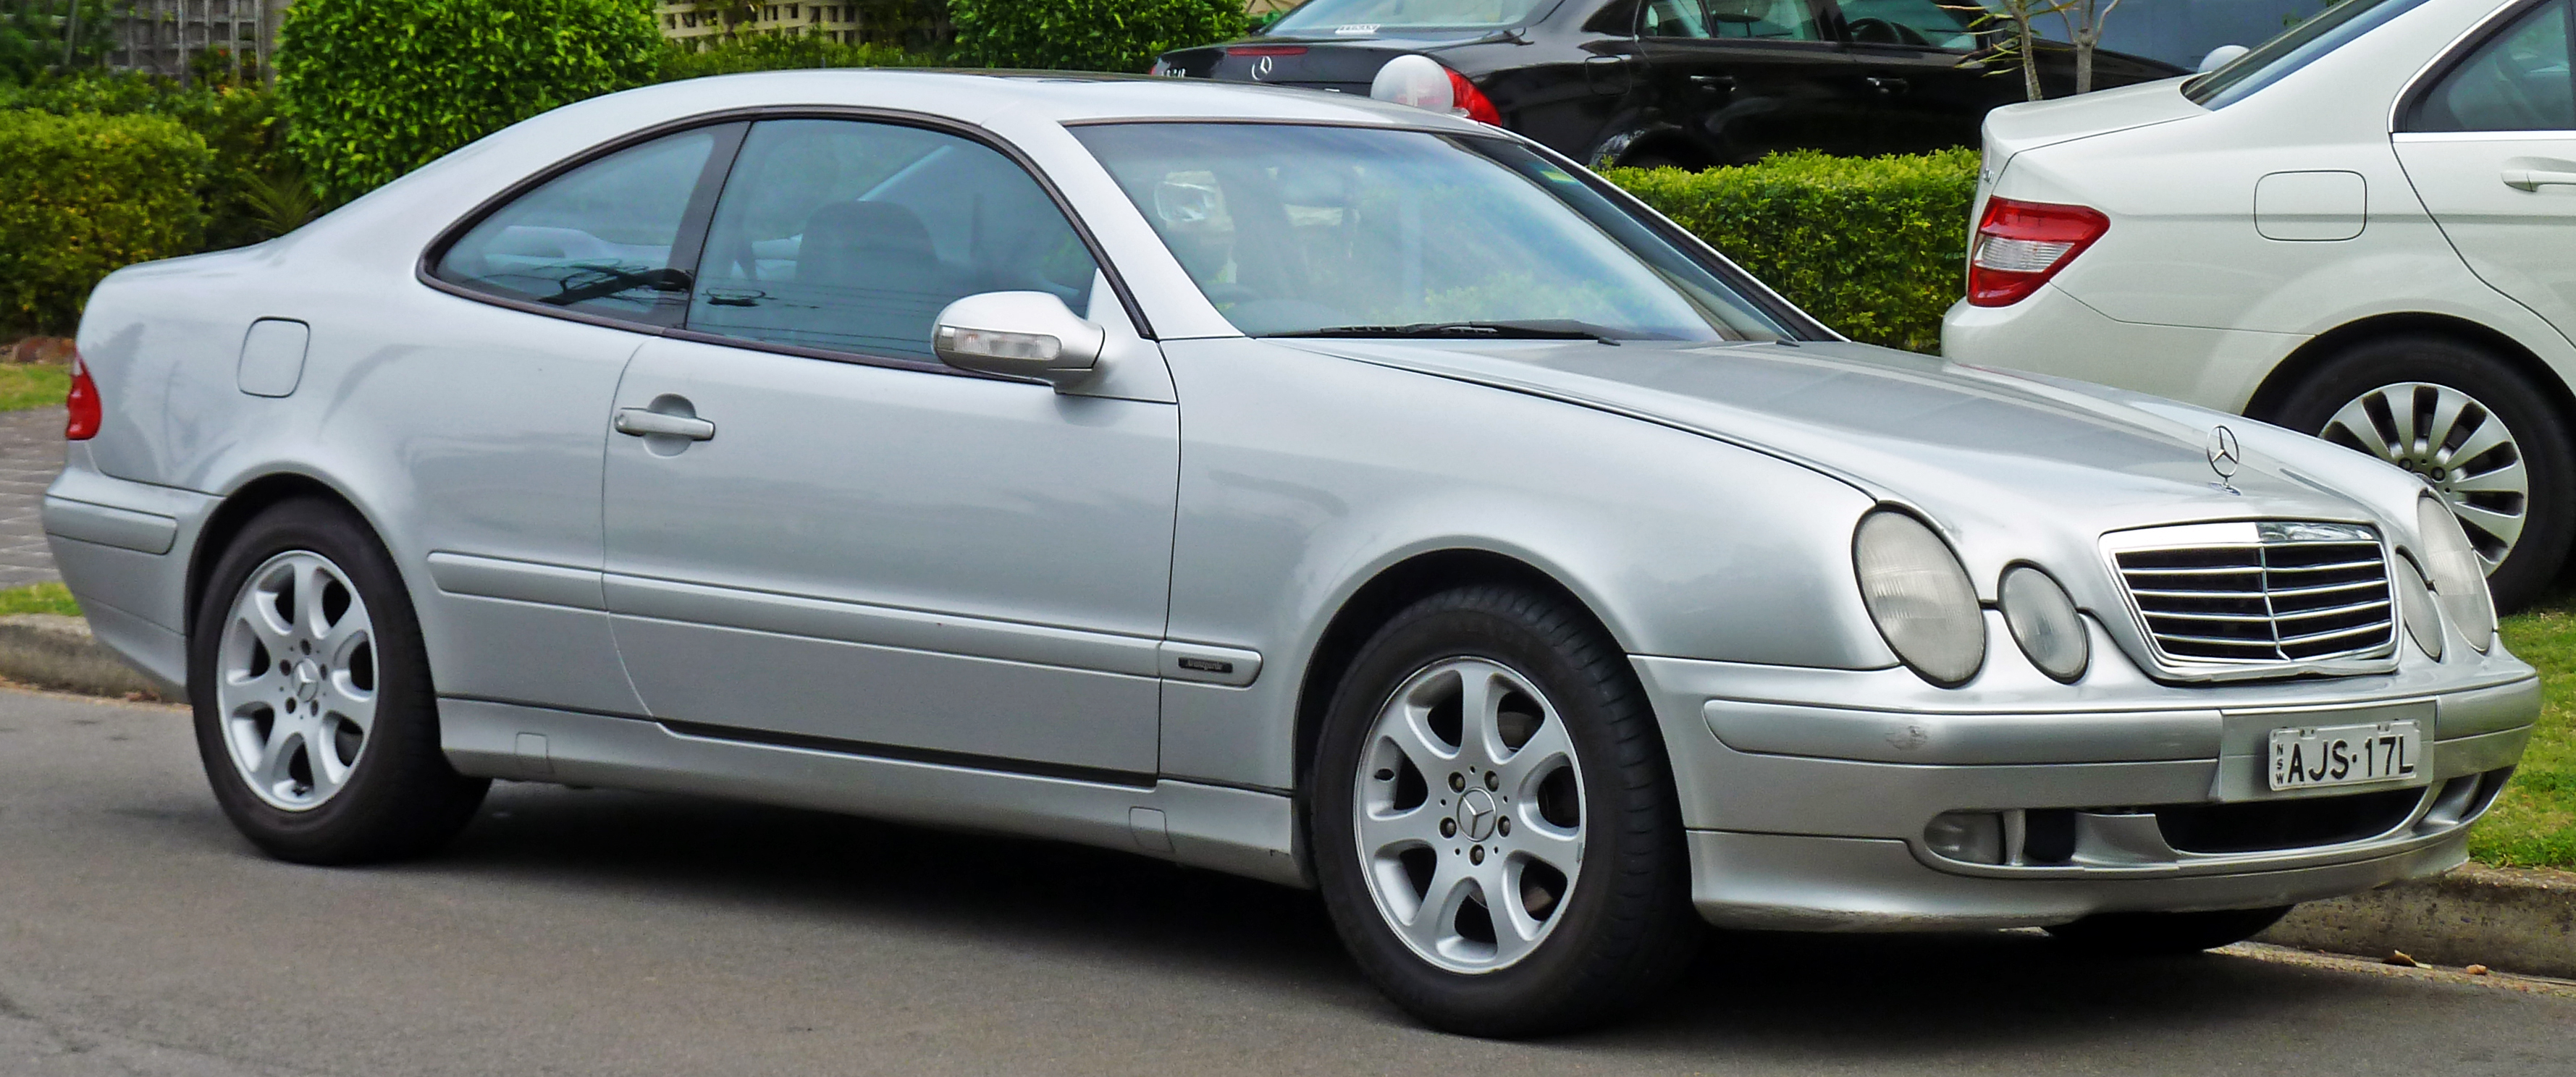 Mercedes-Benz CL-klasse AMG I (C215) 2000 - 2002 Coupe-Hardtop #1